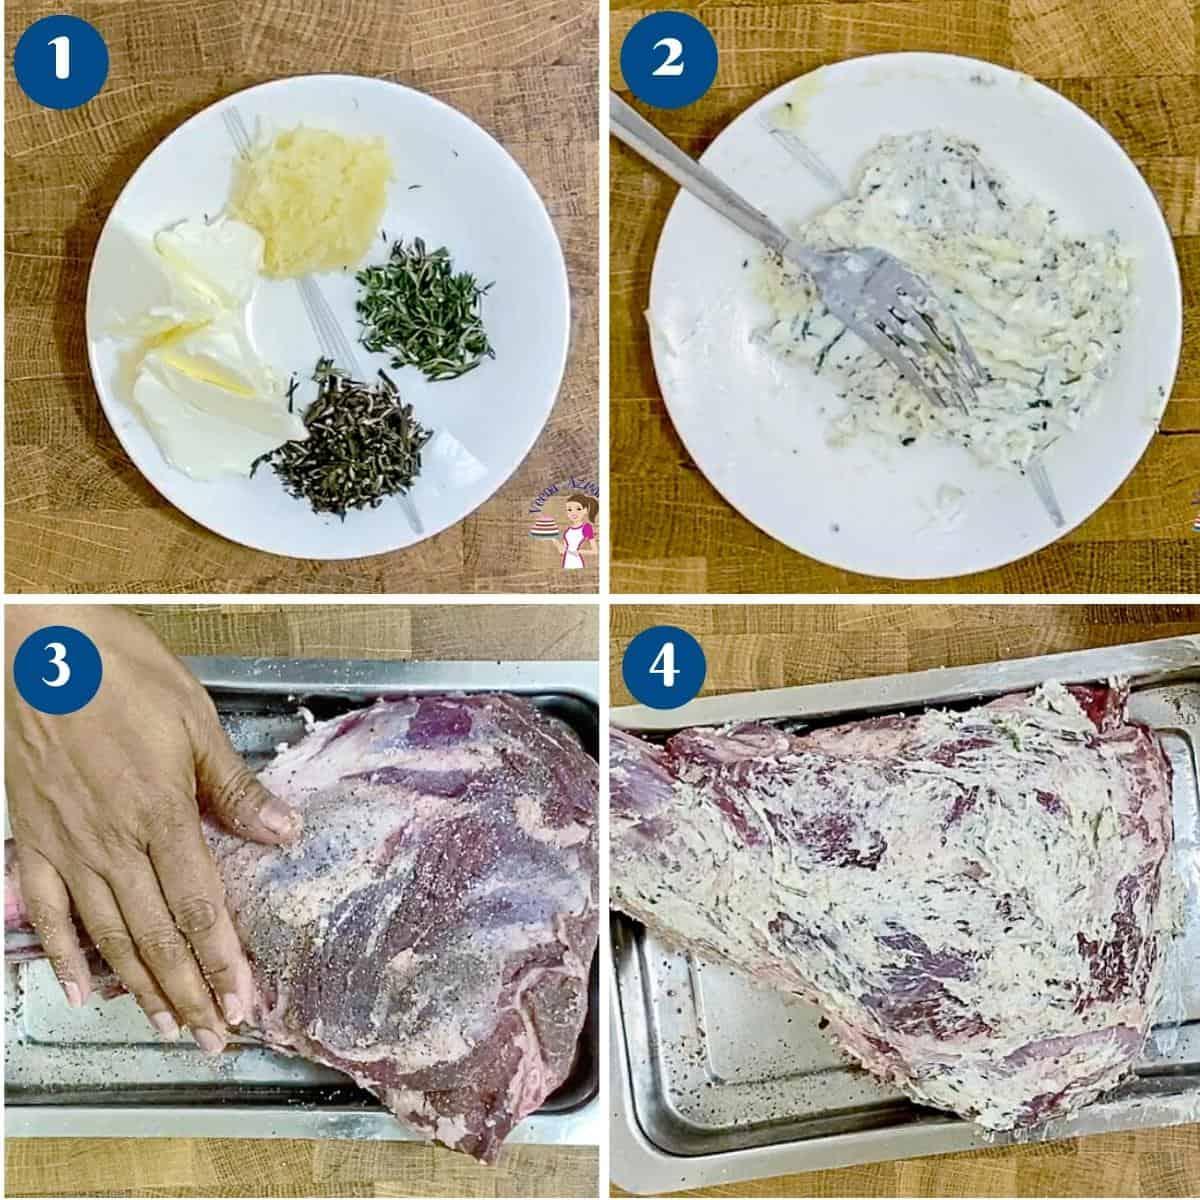 Progress pictures marinating the lamb.